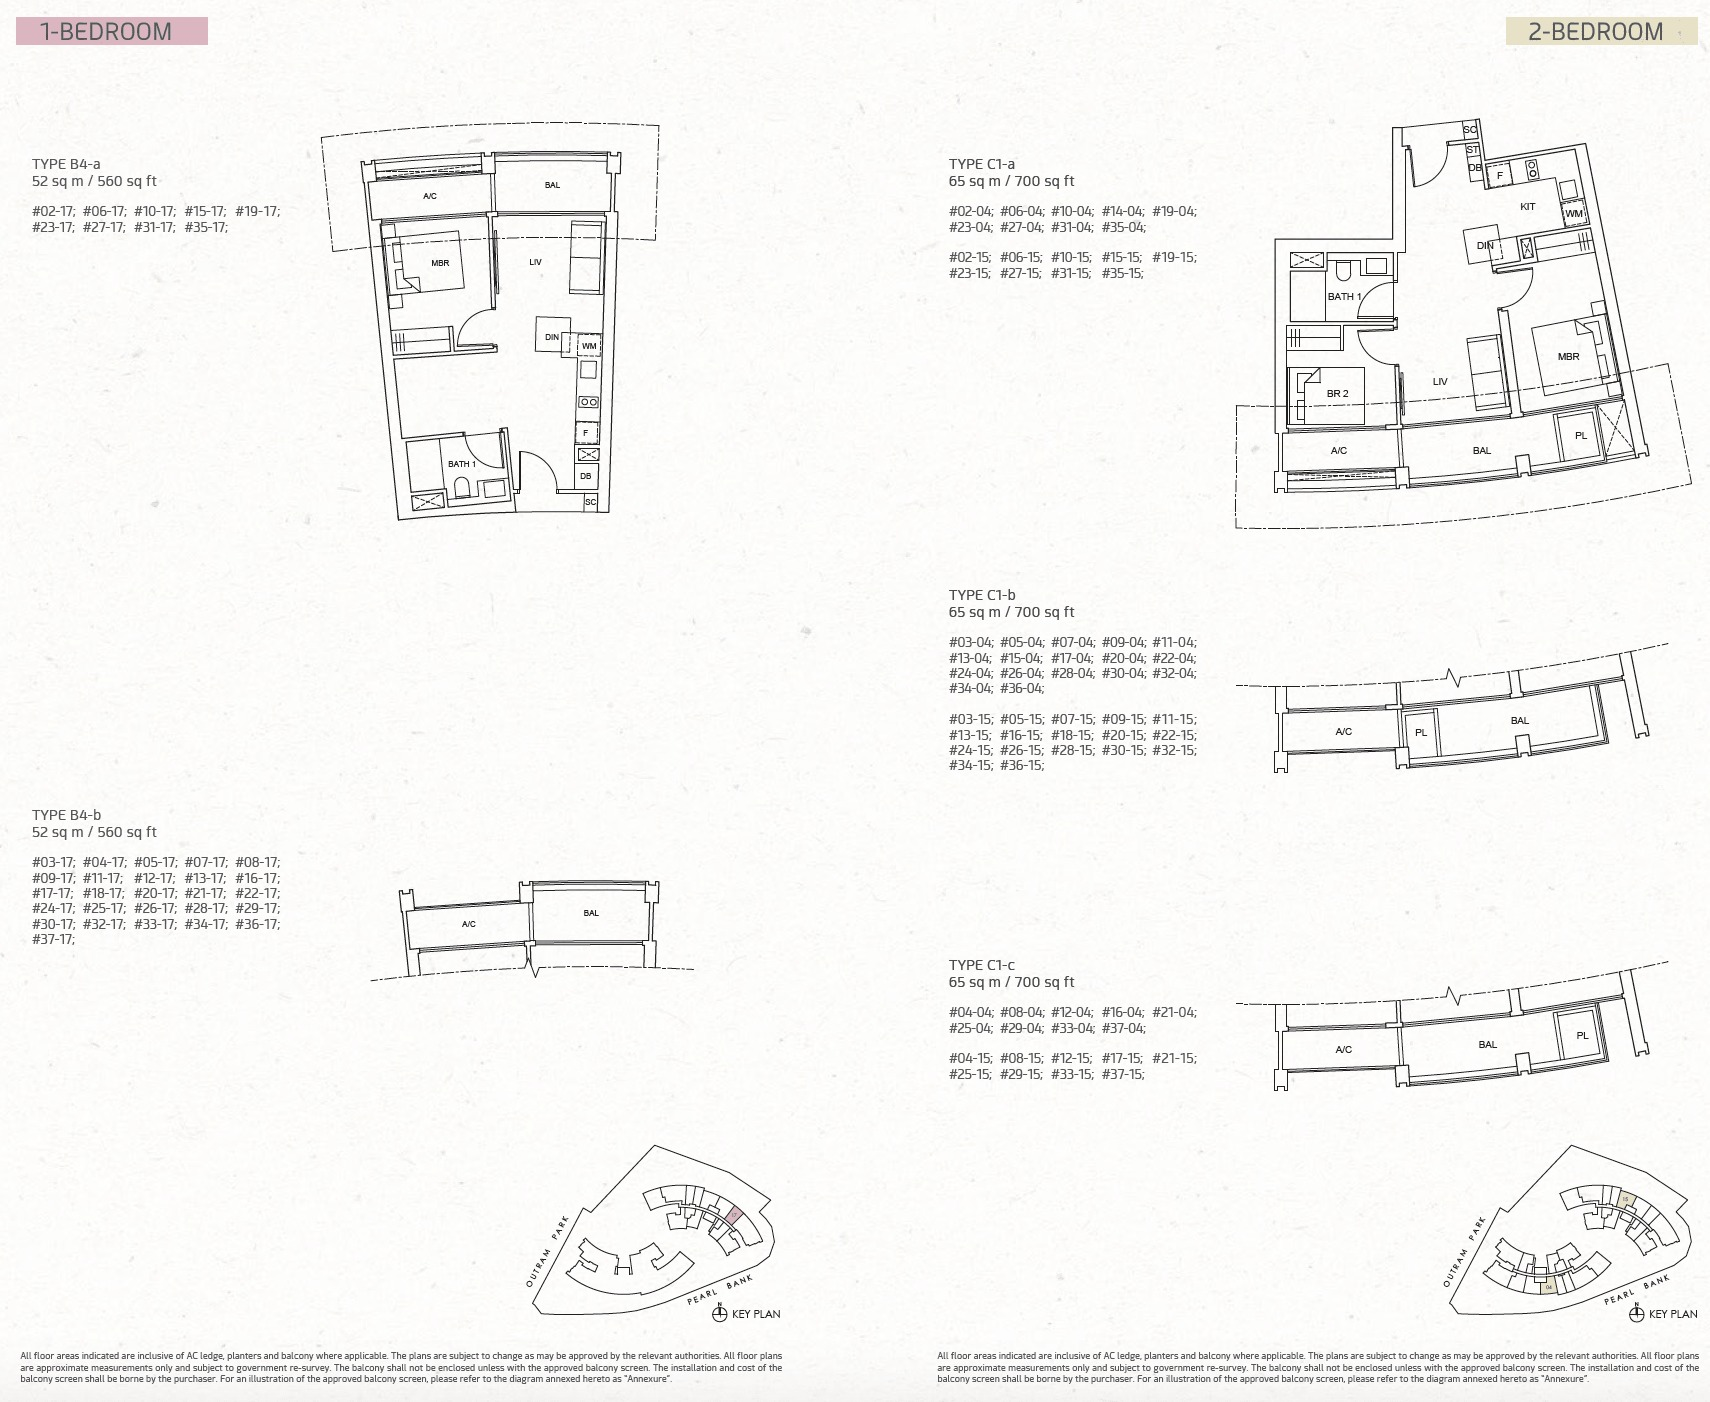 One-Pearl-Bank-floor-plan-1-2-bedroom